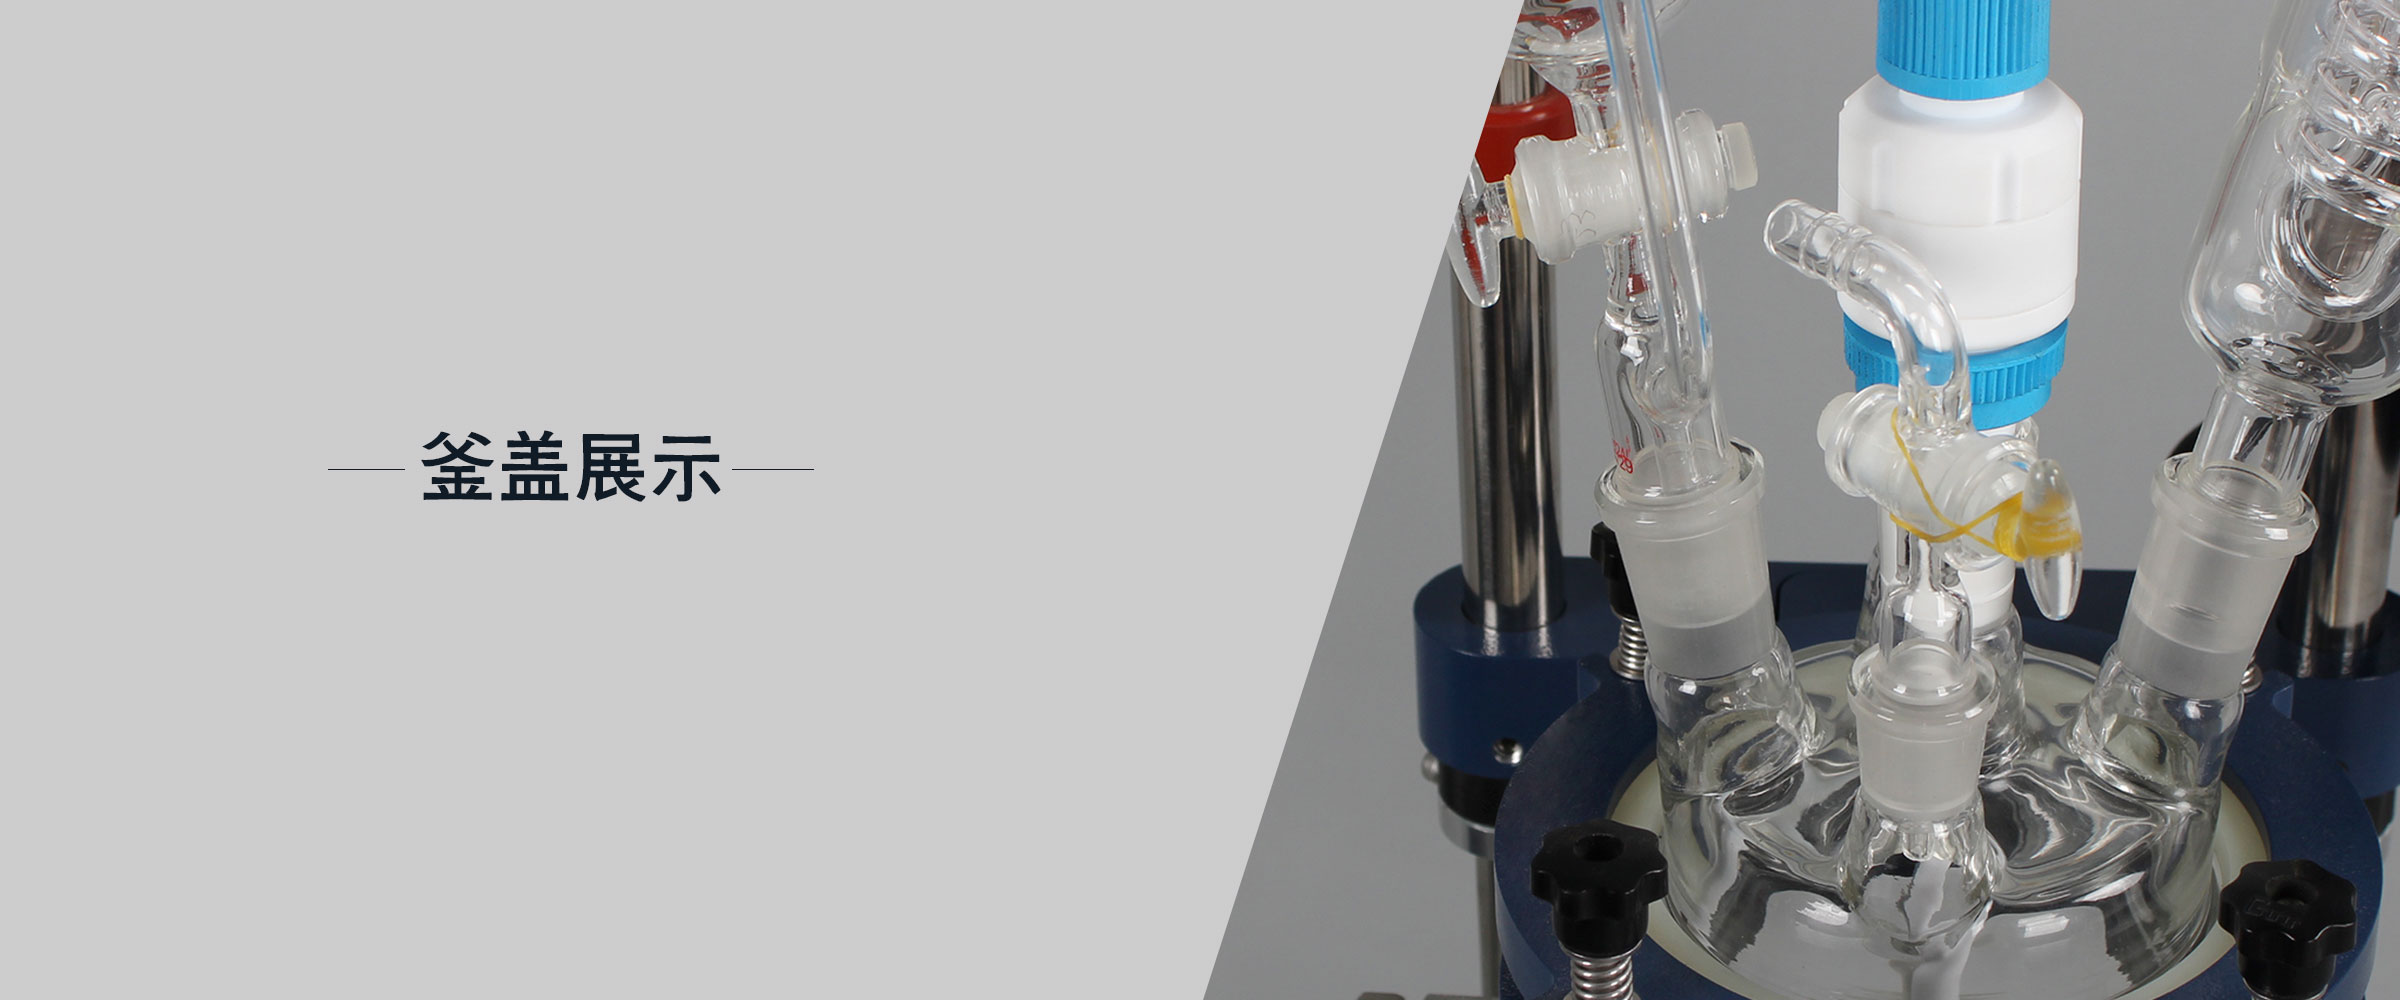 玻璃反应釜 (5)